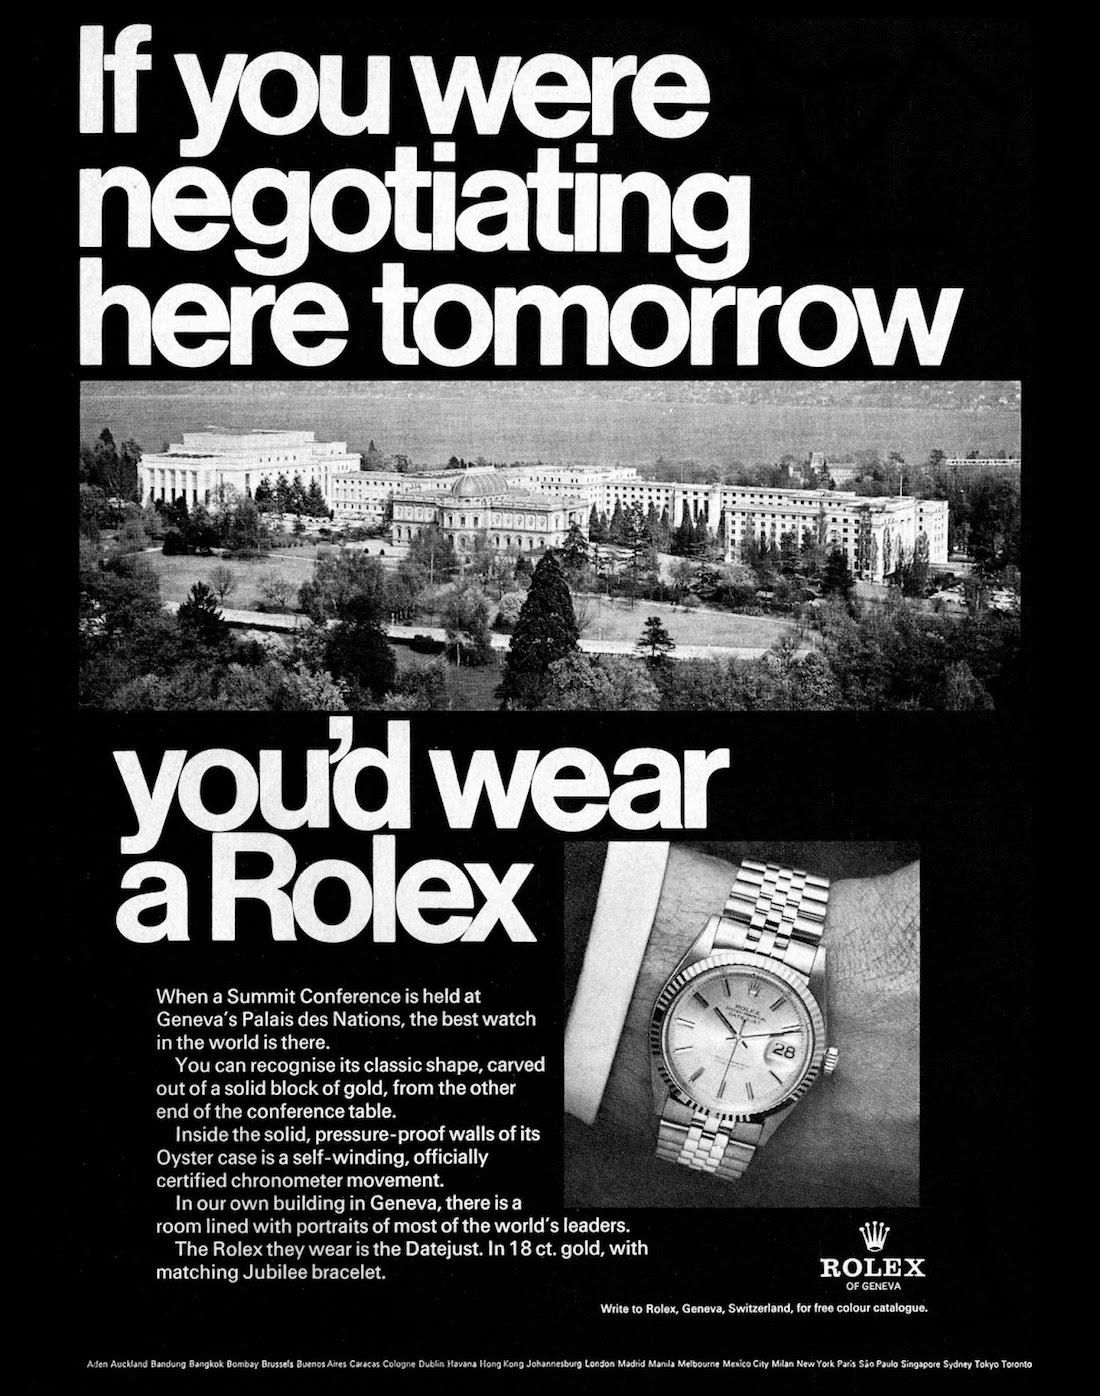 Rolex-Datejust-advertisement-ad-advertising-marketing-vintage-Rolesor-Jubilee-fluted-bezel-aBlogtoWatch-2.jpg